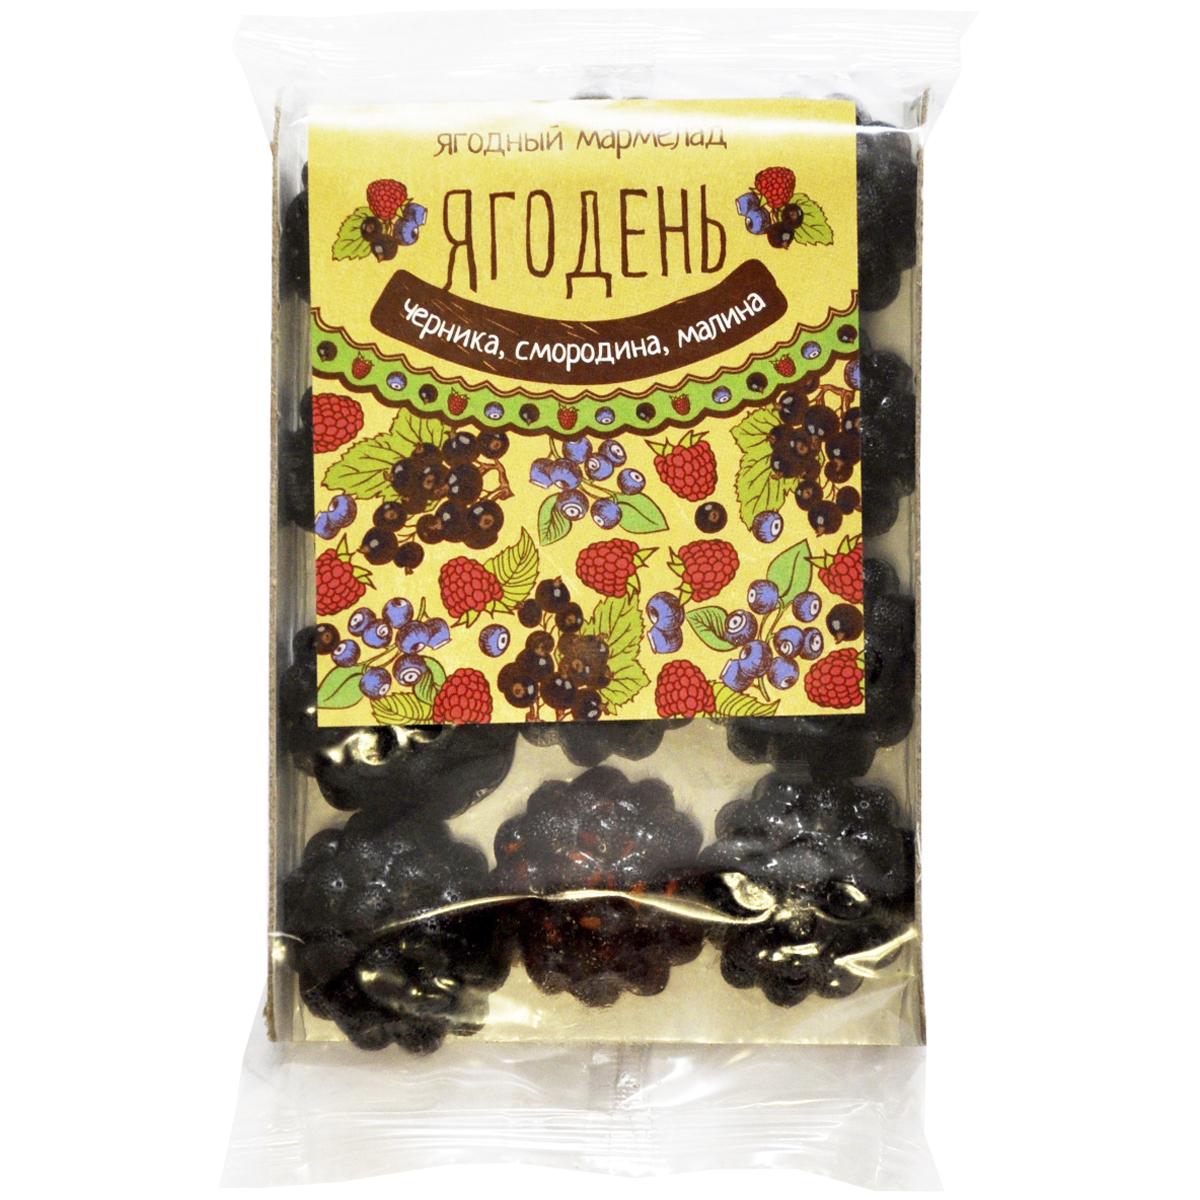 Мармелад Ягодень Сибирский Кедр ассорти: черника, смородина, малина 165 гр